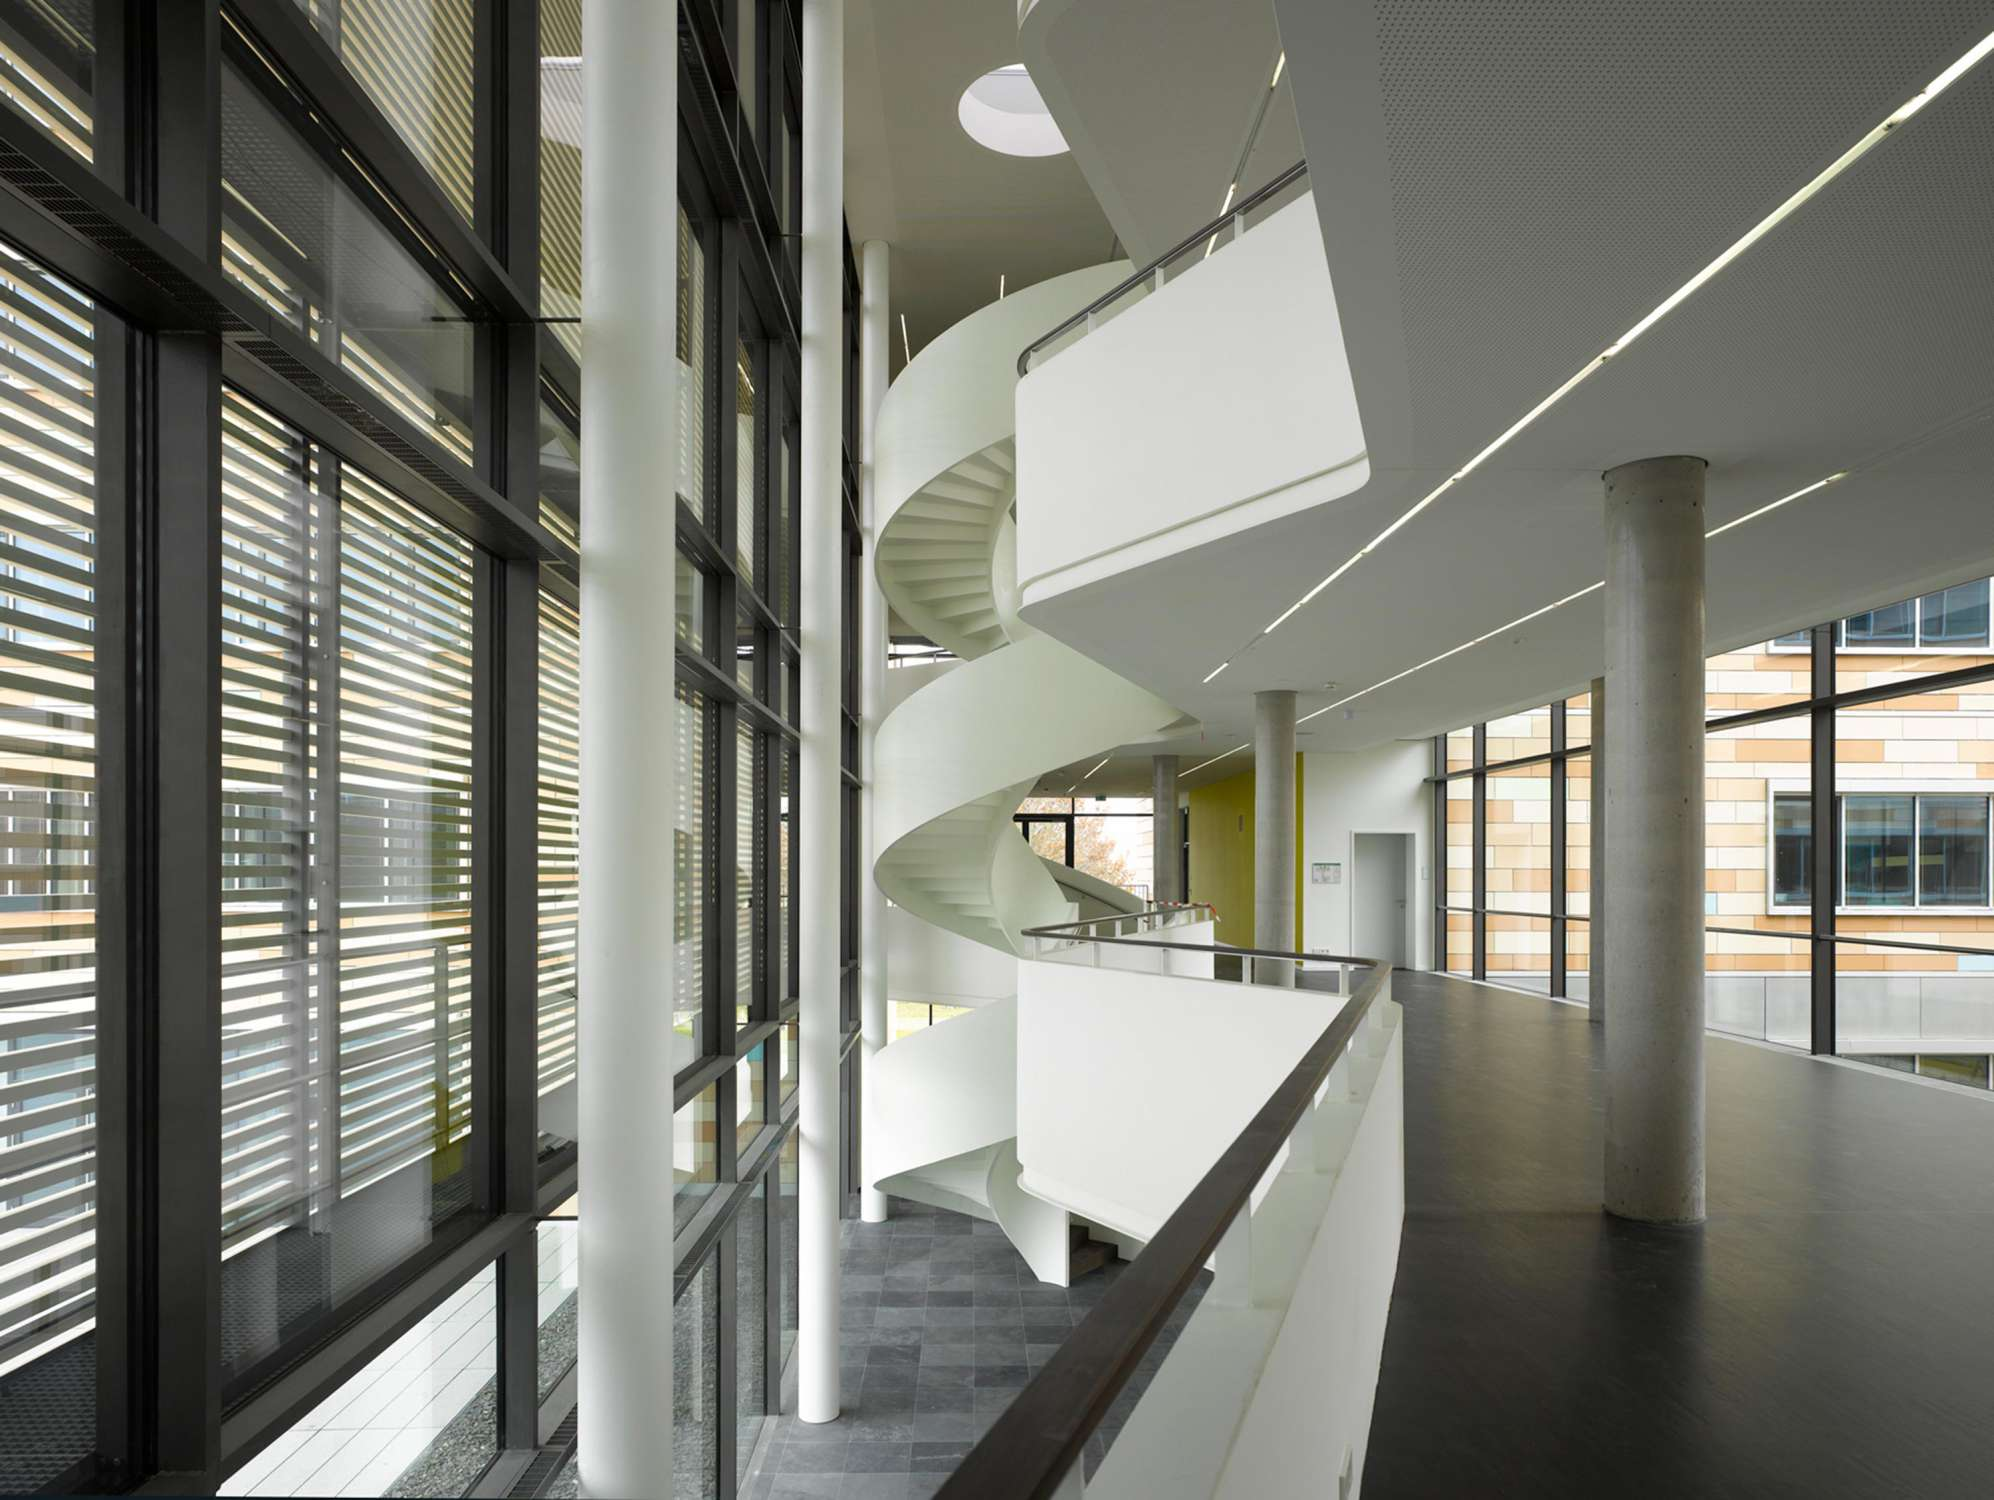 Max-Planck-Institut für Chemie (8)